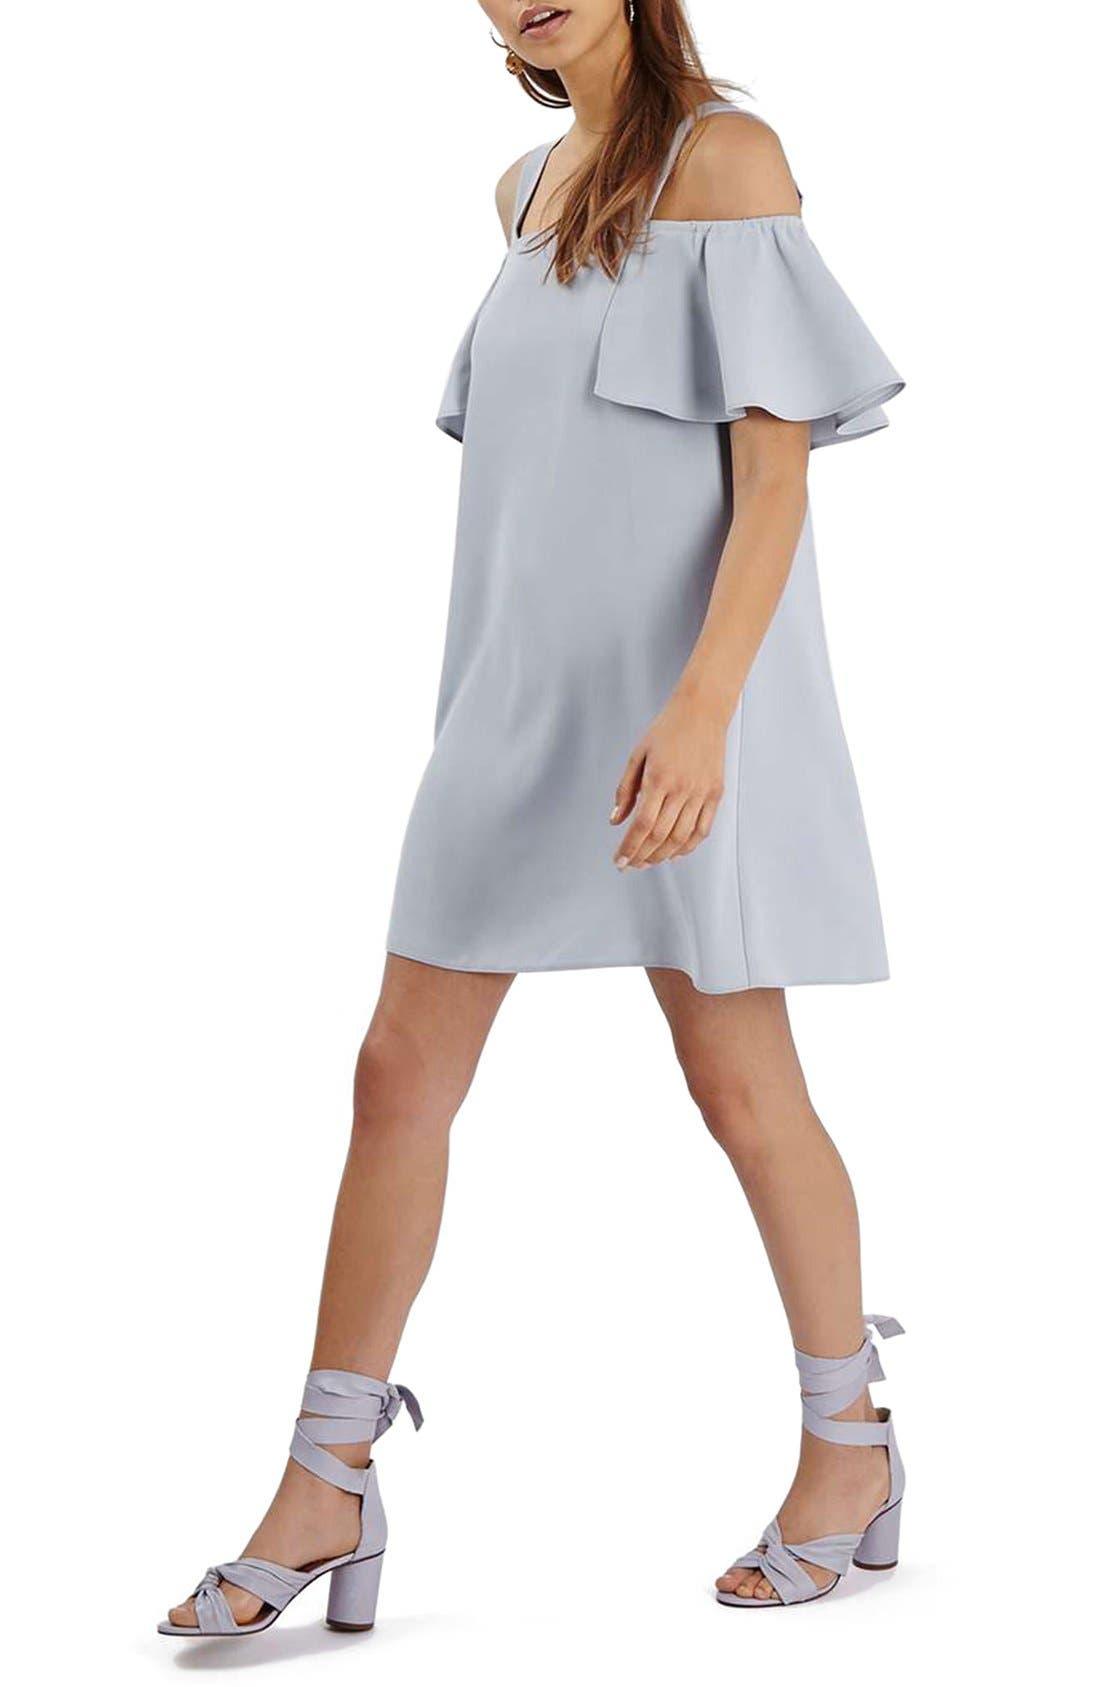 TOPSHOP,                             Cold Shoulder Shift Dress,                             Main thumbnail 1, color,                             050